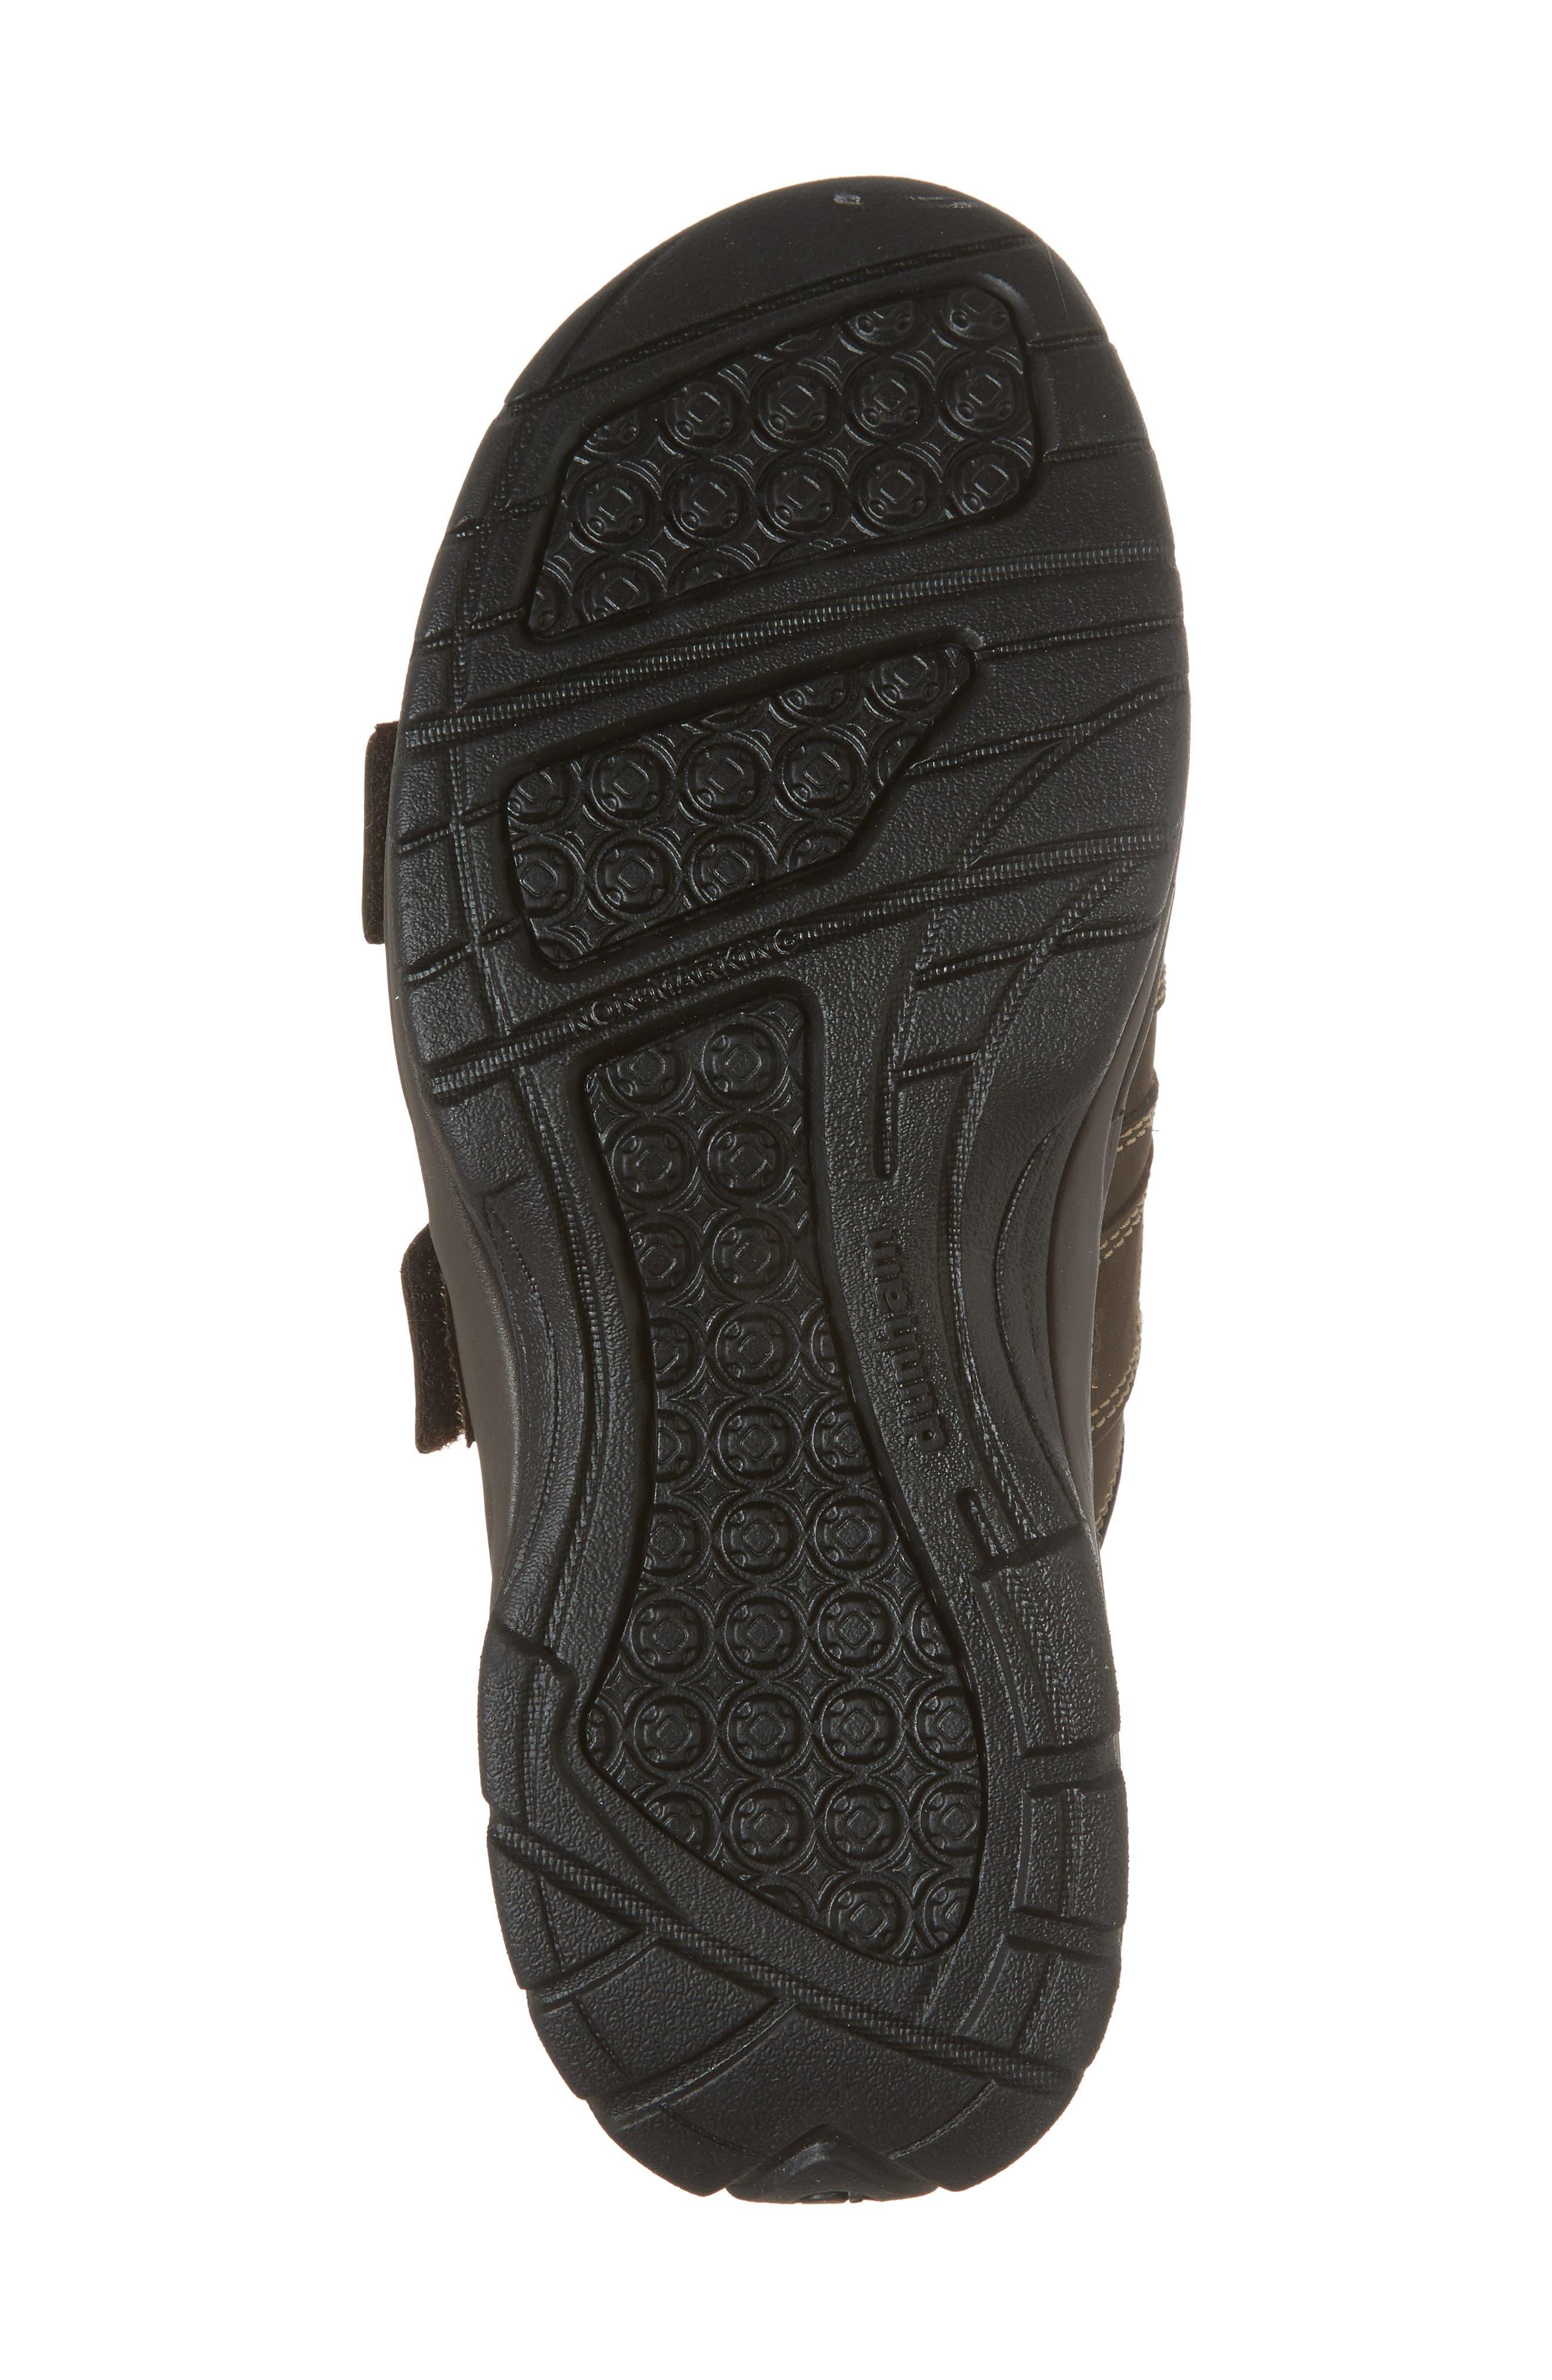 Newport Slide Sandal,                             Alternate thumbnail 6, color,                             DARK BROWN LEATHER